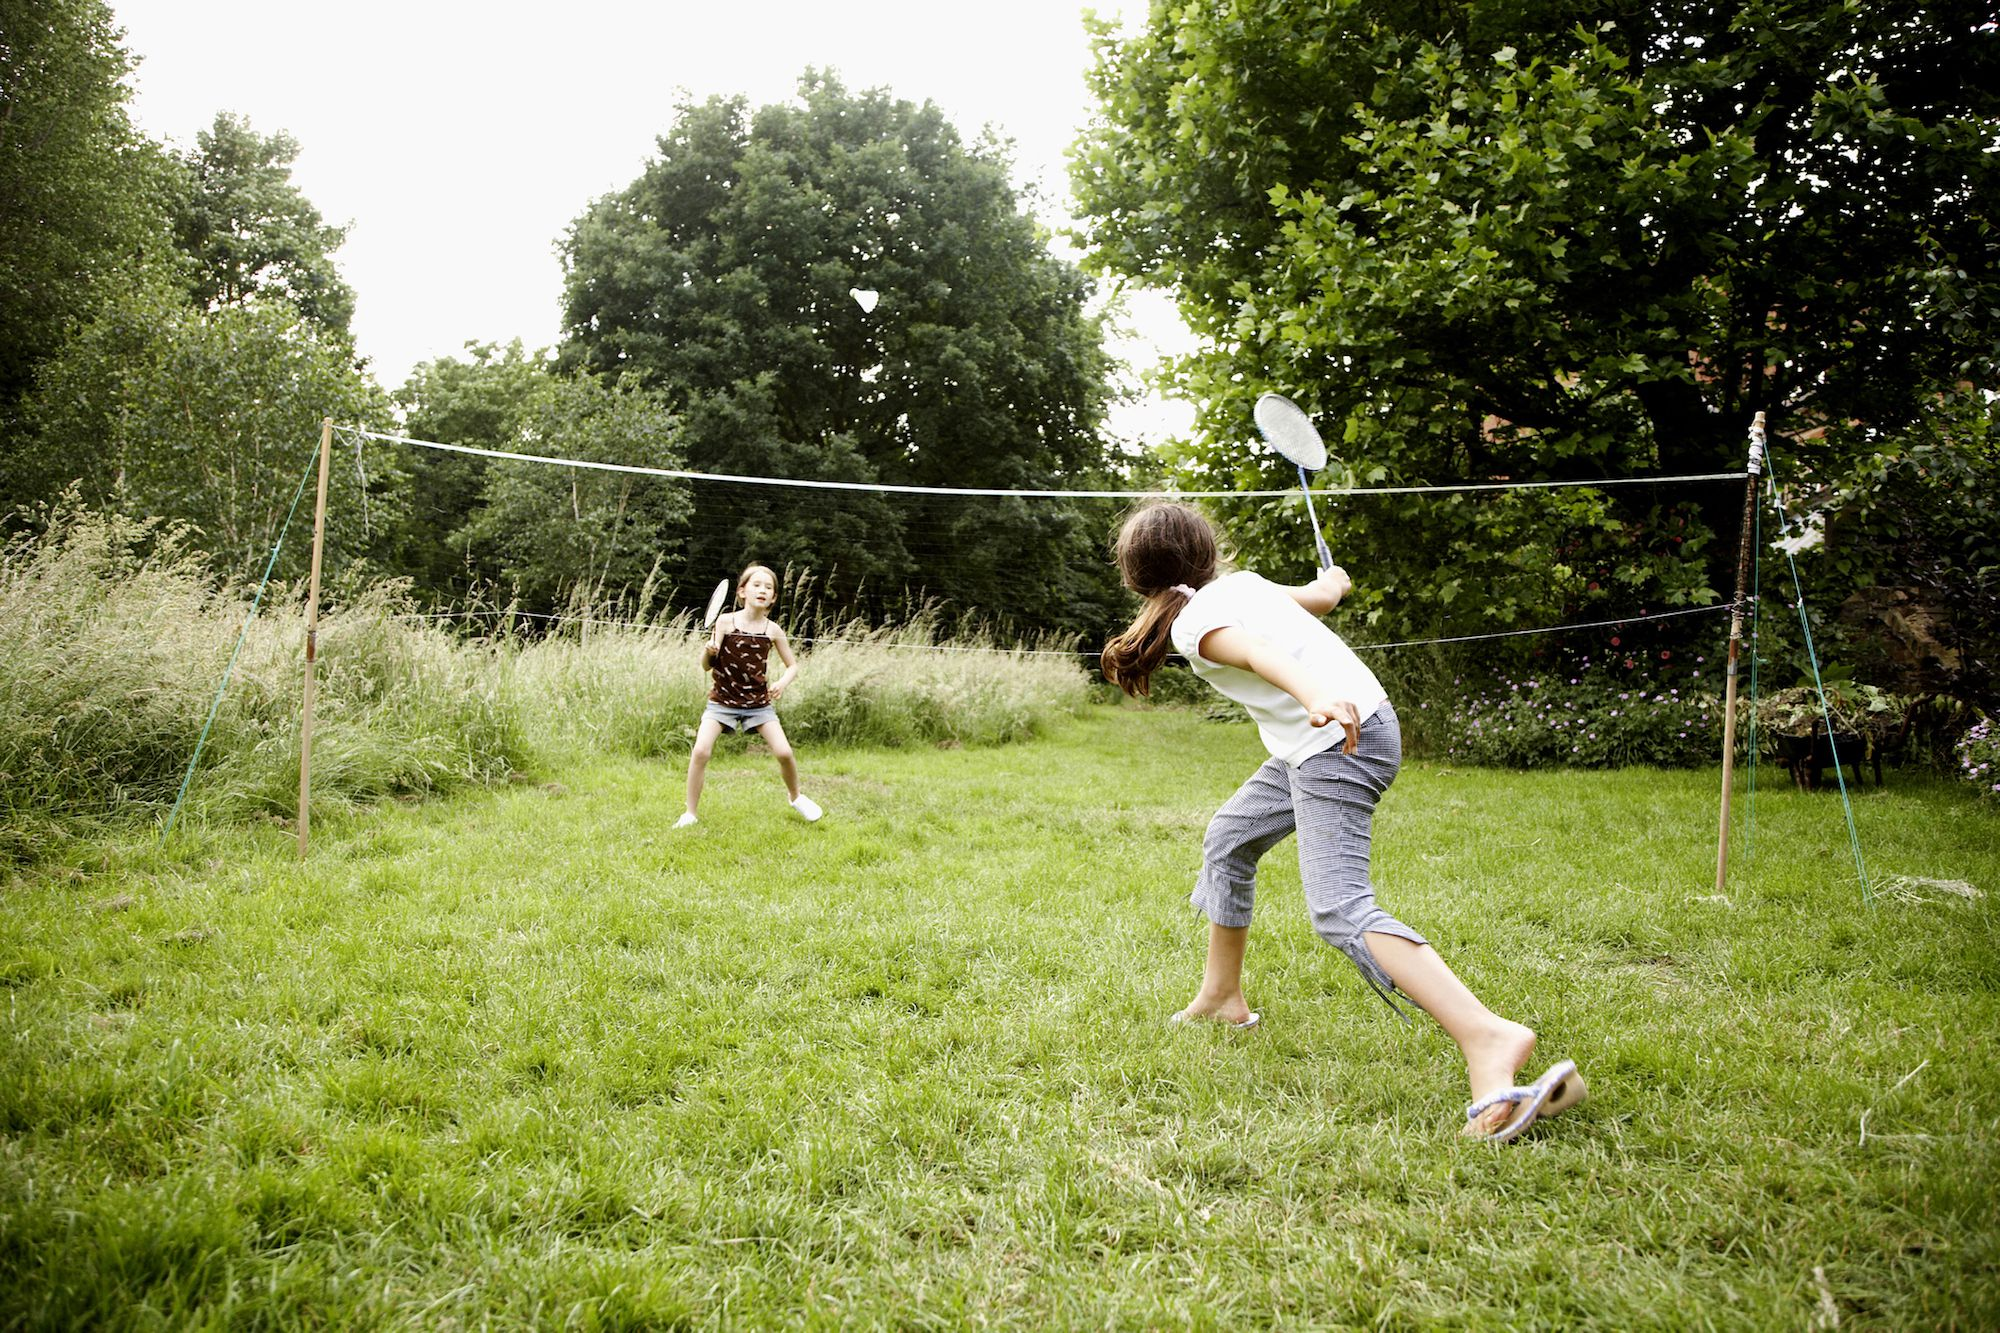 Child playing badminton